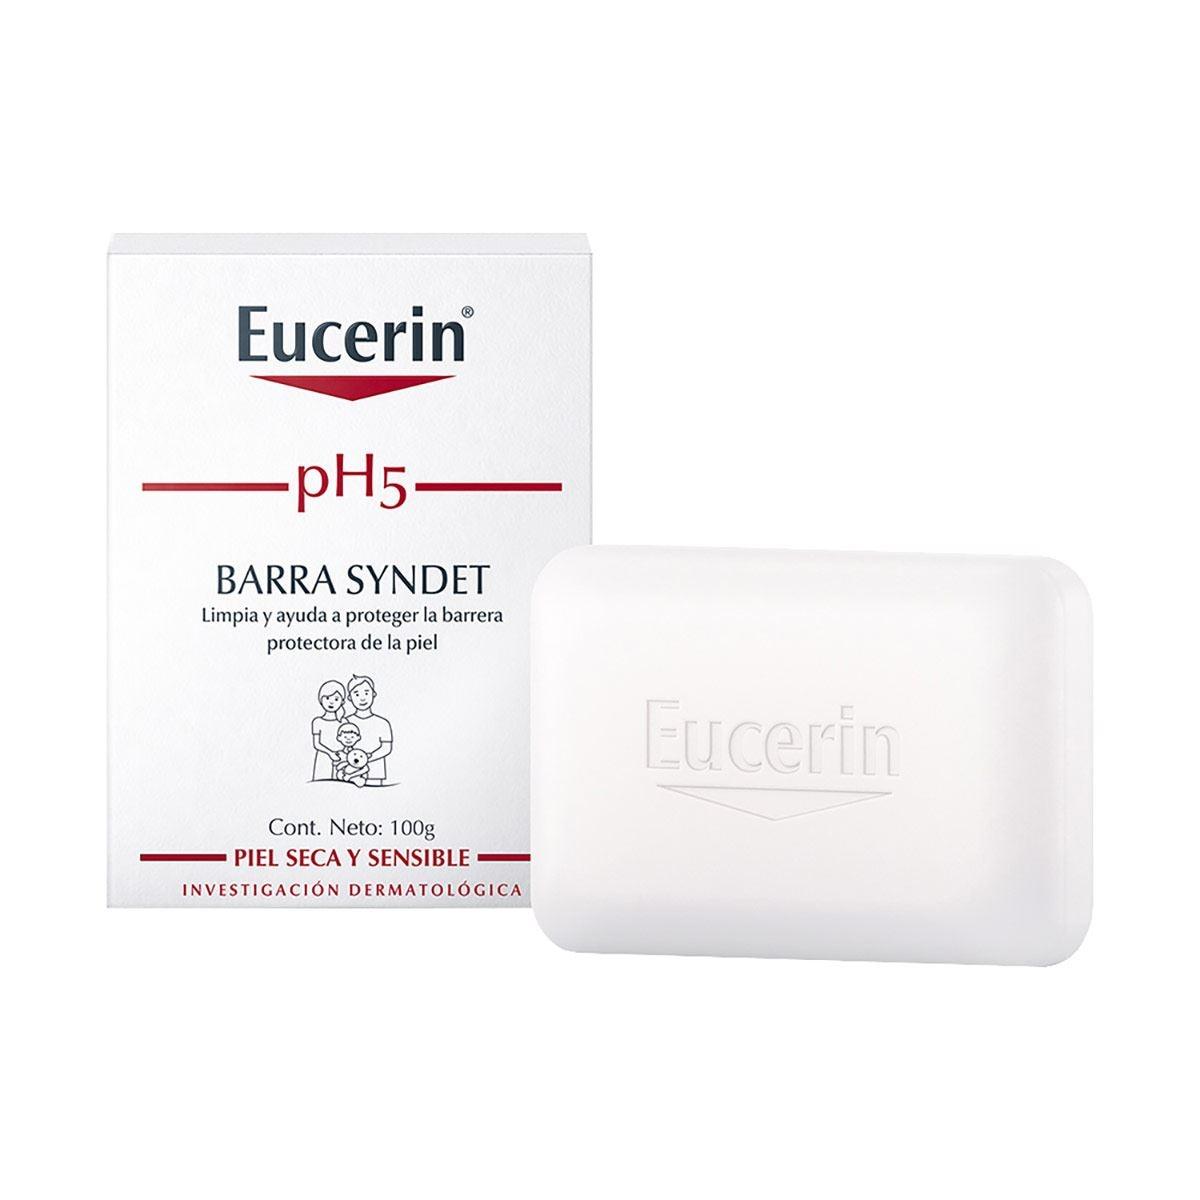 Eucerin, ph5 jabón, 100gr  - Sanborns